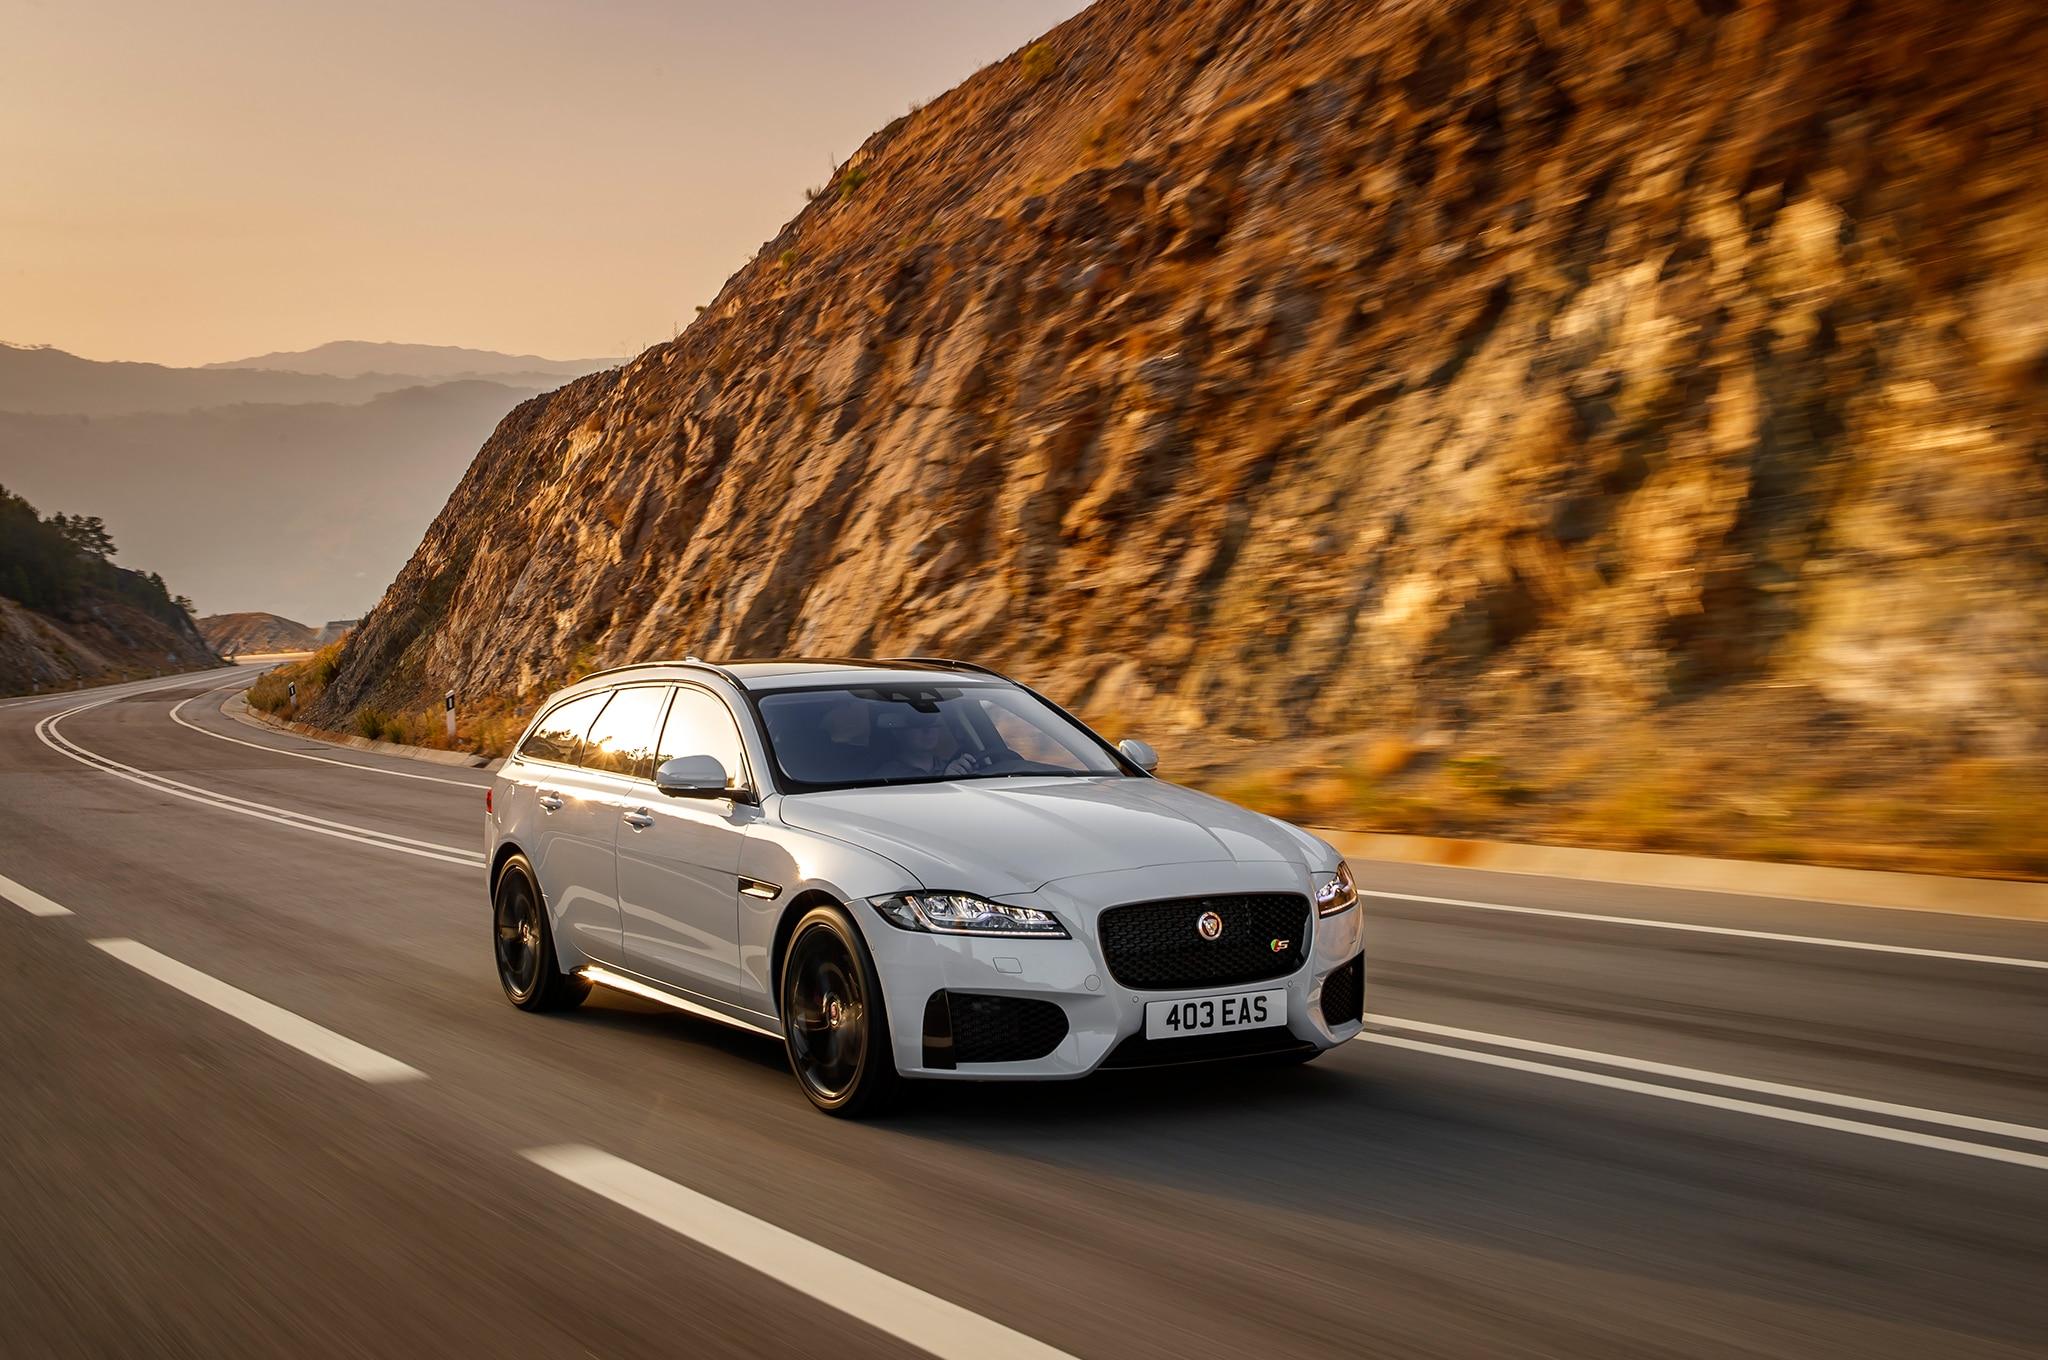 2019 jaguar xf adds limited edition 300 sport model